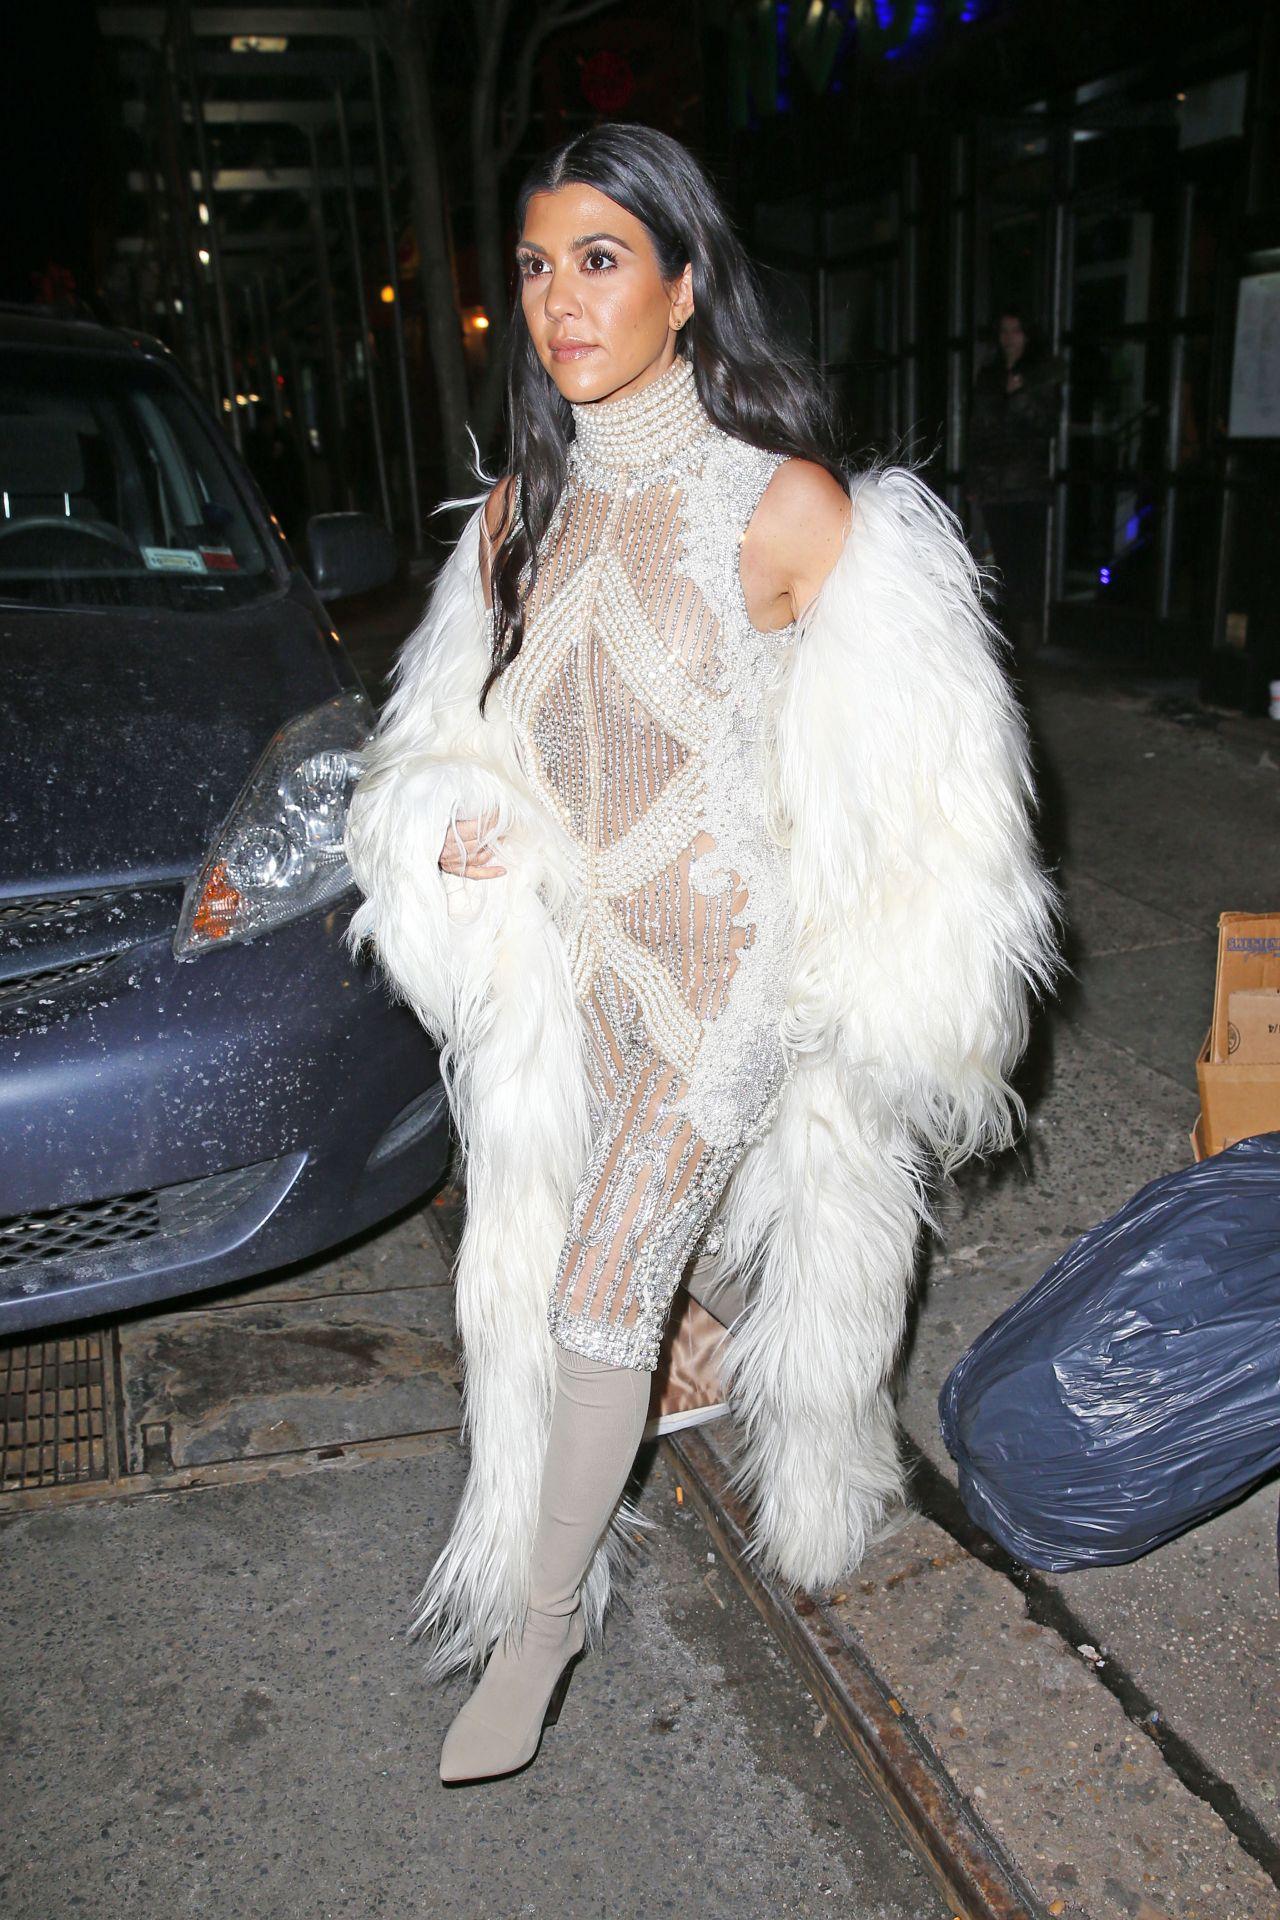 Kardashian Style - at Negril Village Restaurant in New York City ...